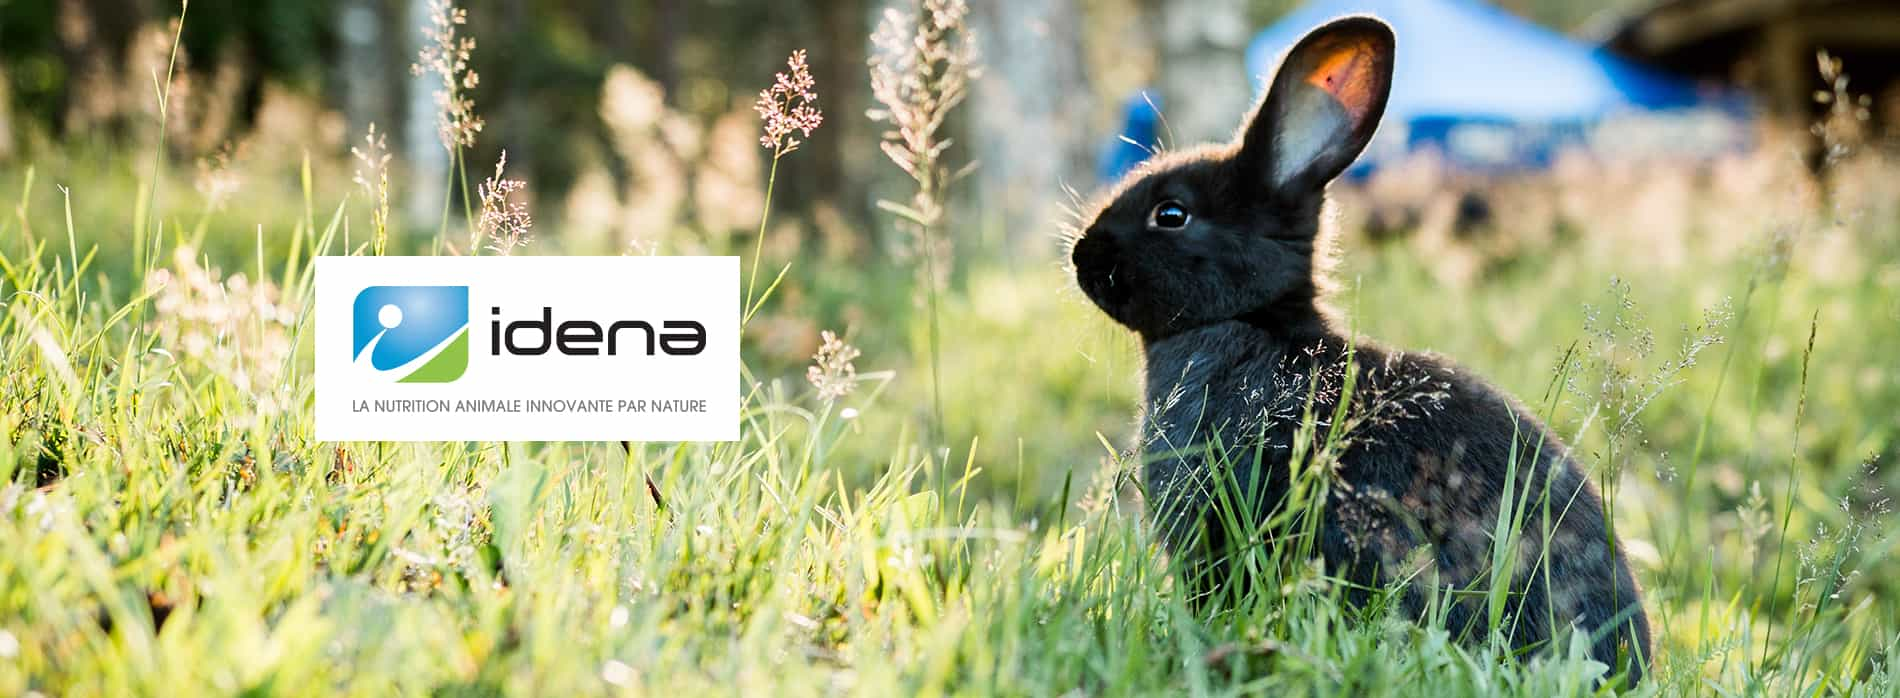 Idena Nutrition animale